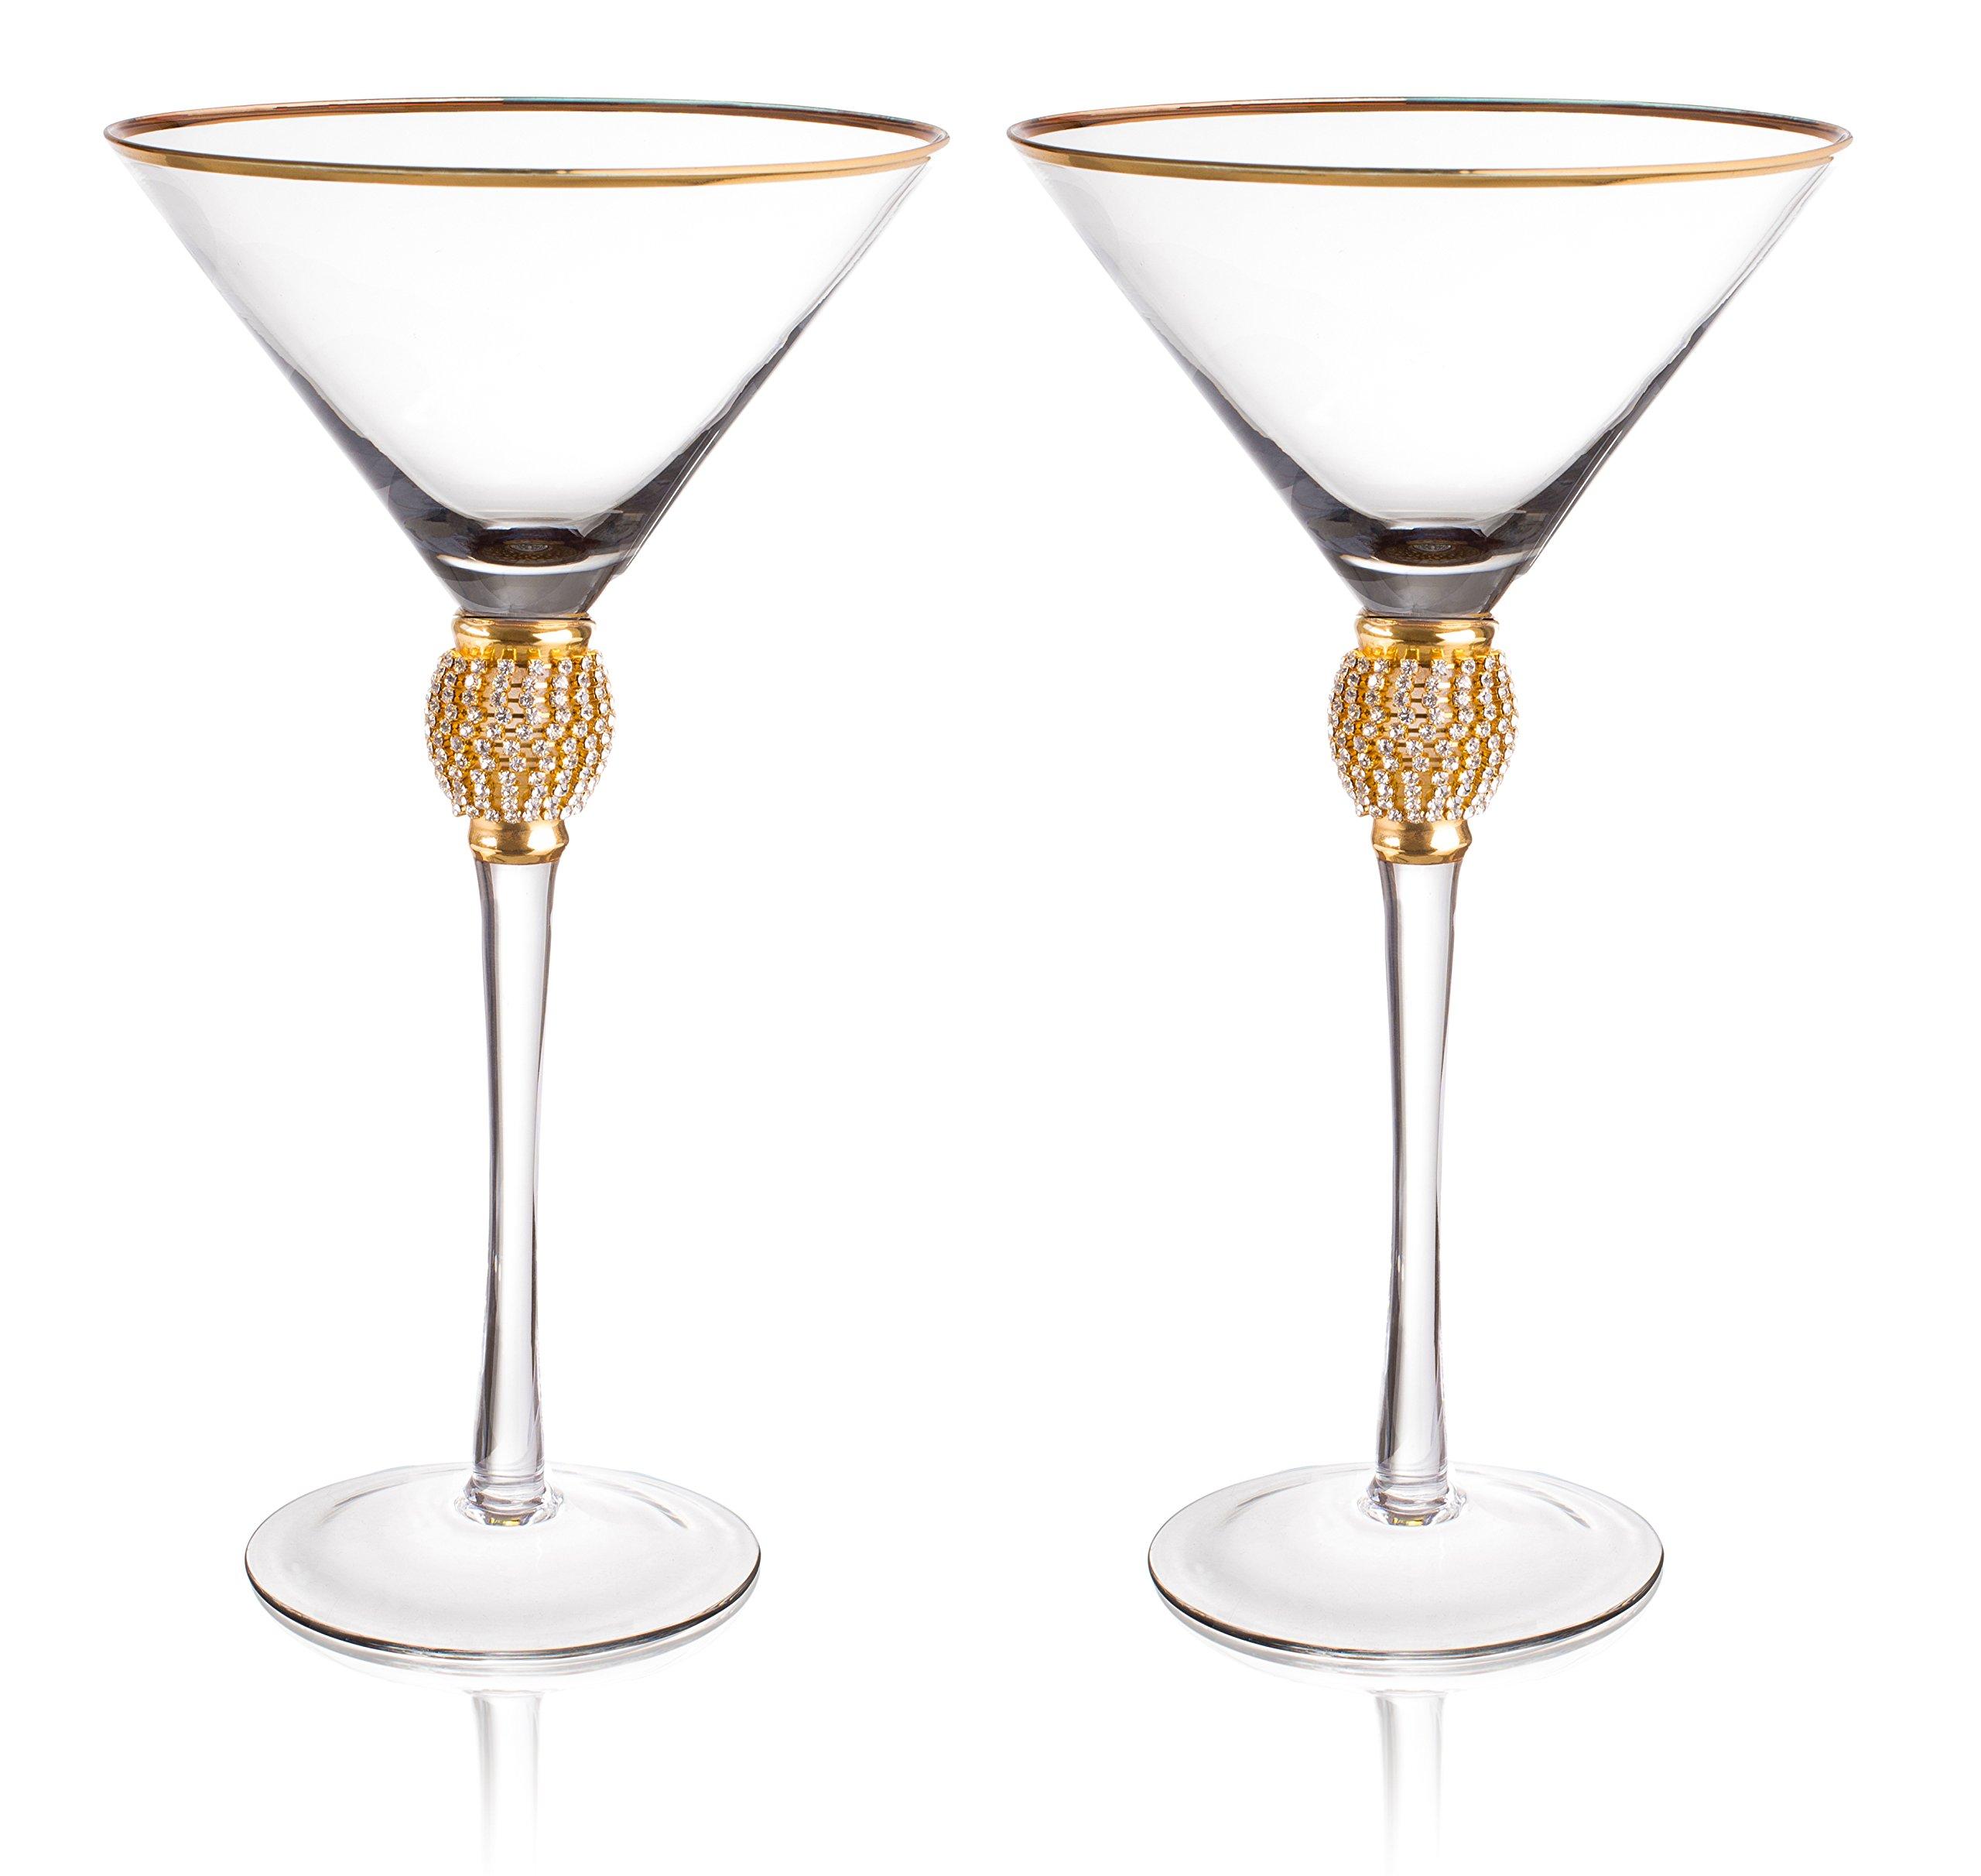 Trinkware Set of 2 Stemmed Martini Glasses - Rhinestone''DIAMOND'' Studded With Gold Rim - Long Stem, 12oz, 9-inches Tall – Elegant Glassware And Stemware